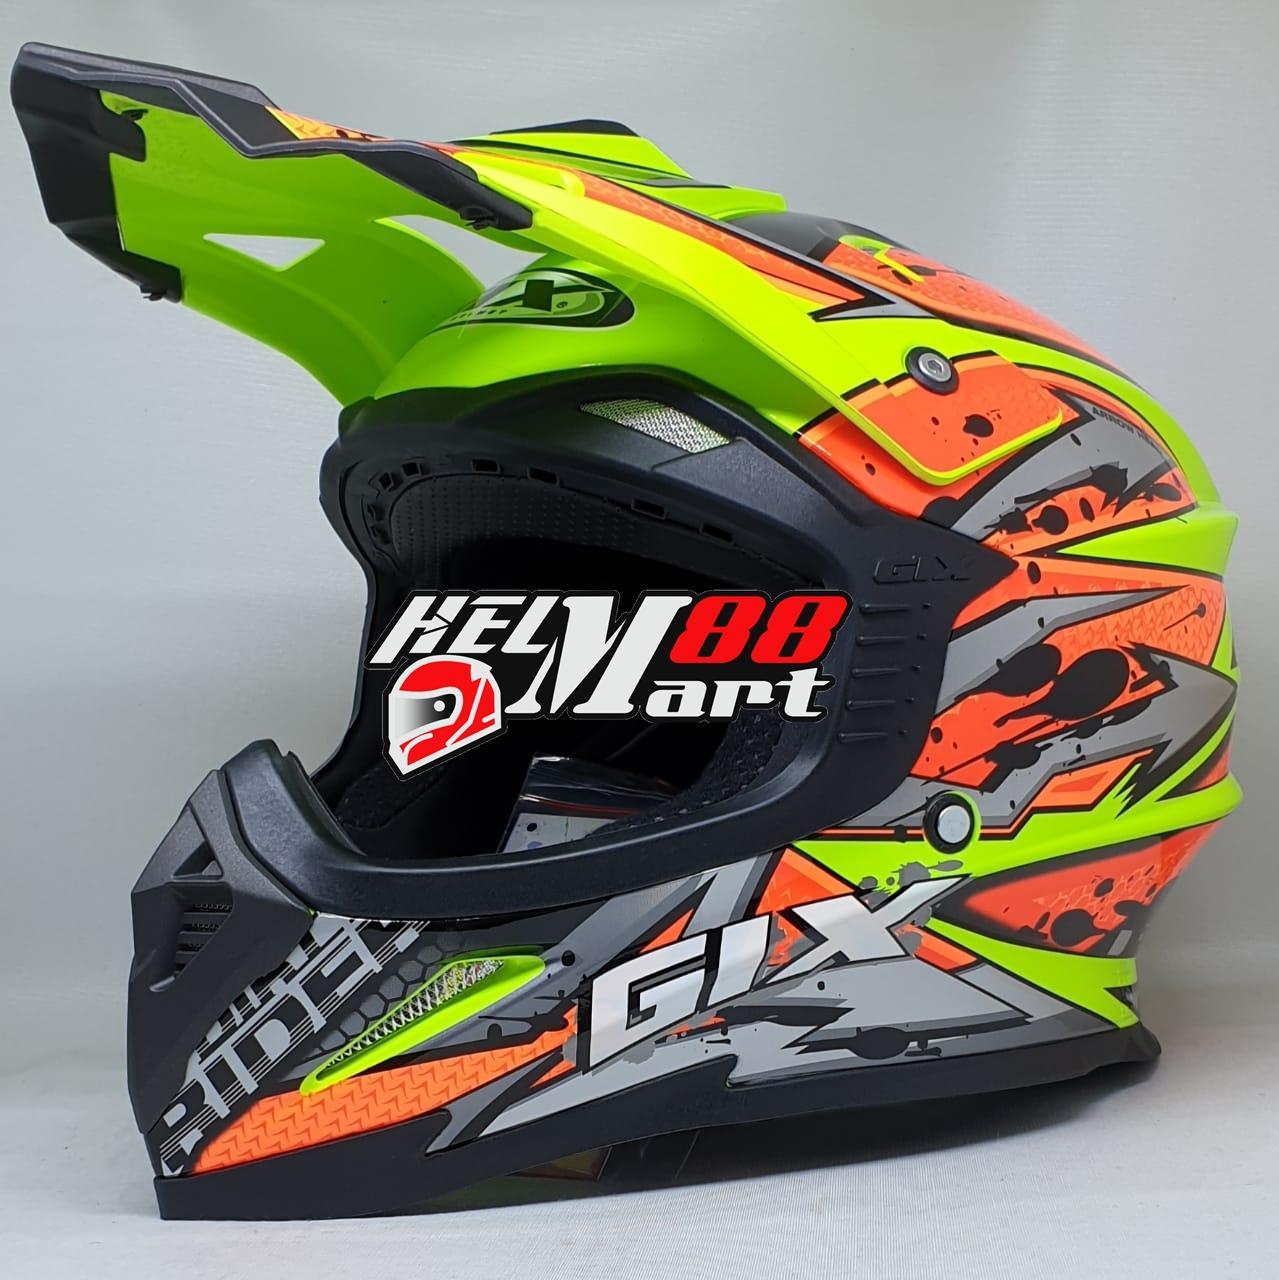 GIX Cross Arrowhead Helm Motocross Helm Supercross